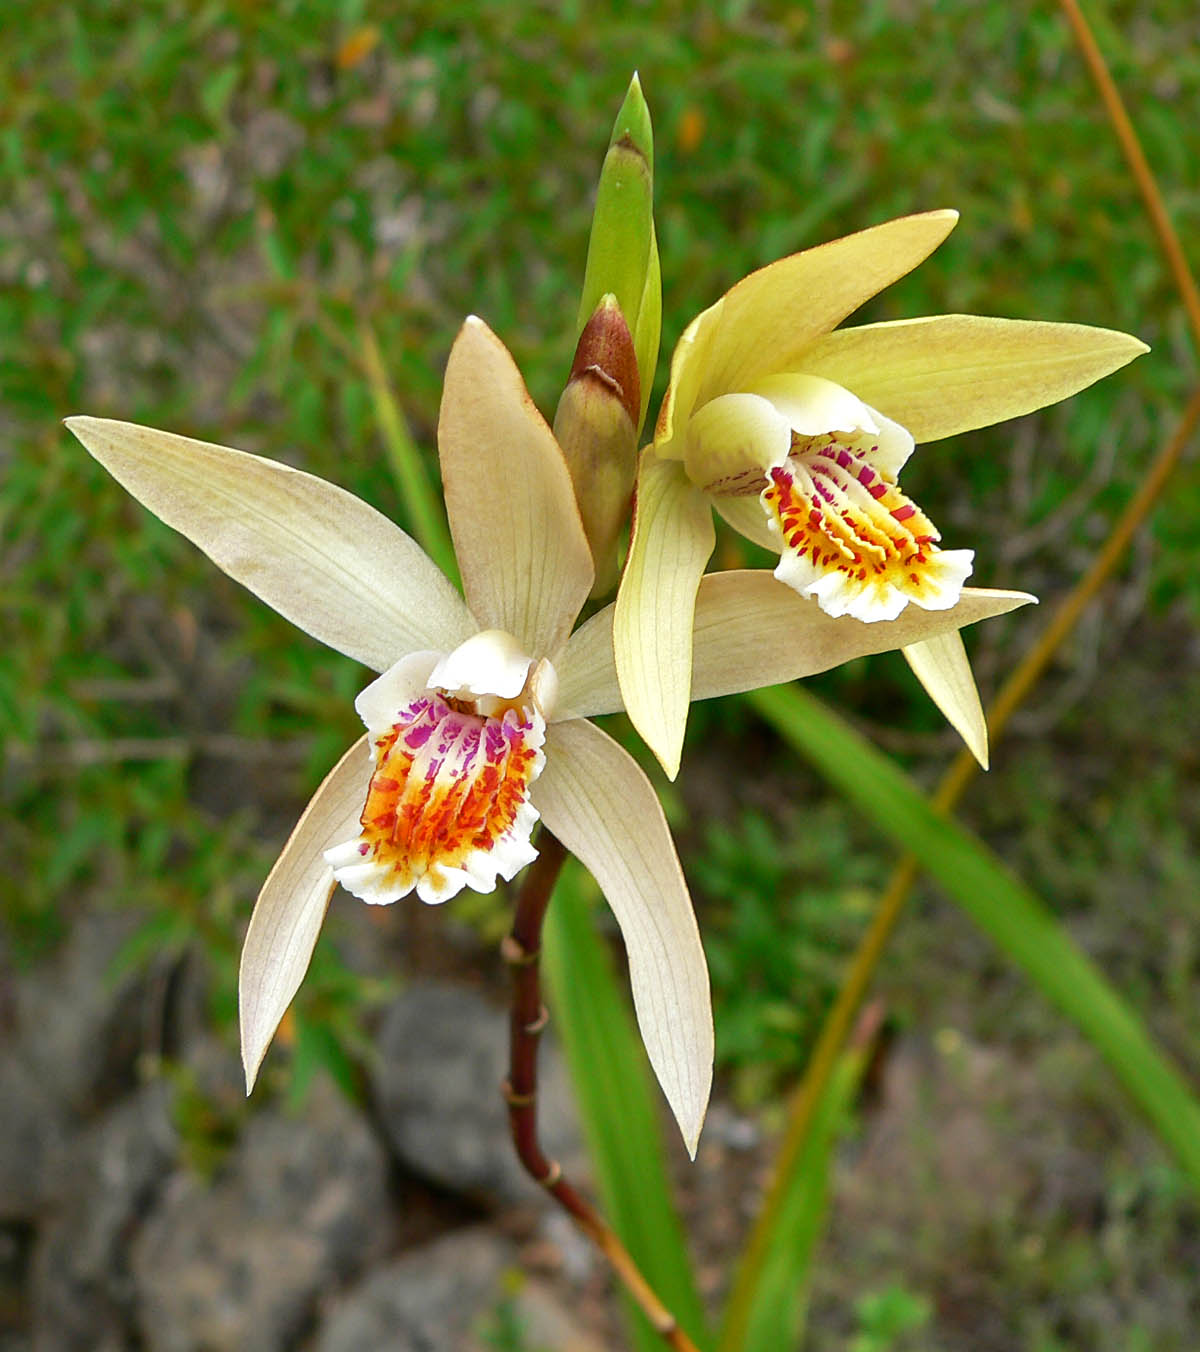 http://images3.wikia.nocookie.net/__cb20080112071351/orchids/en/images/3/3a/Bletilla_ochracea.jpg